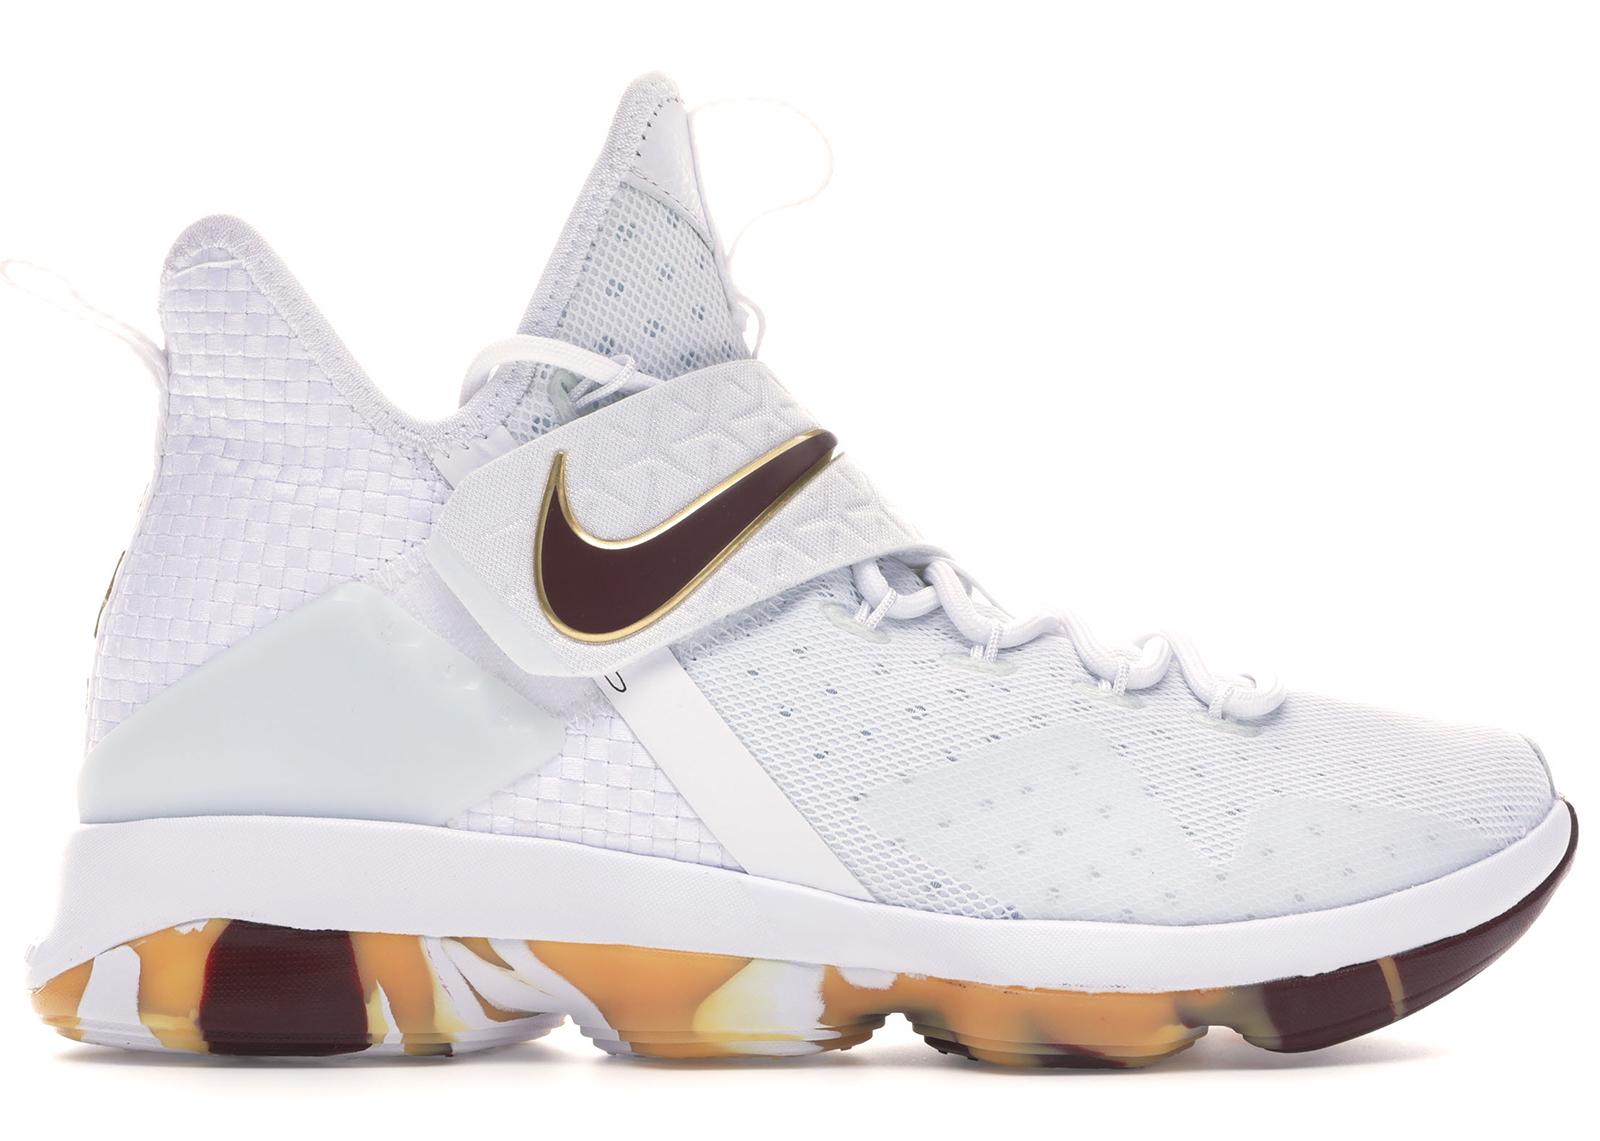 Nike LeBron 14 Wine - 852405-104